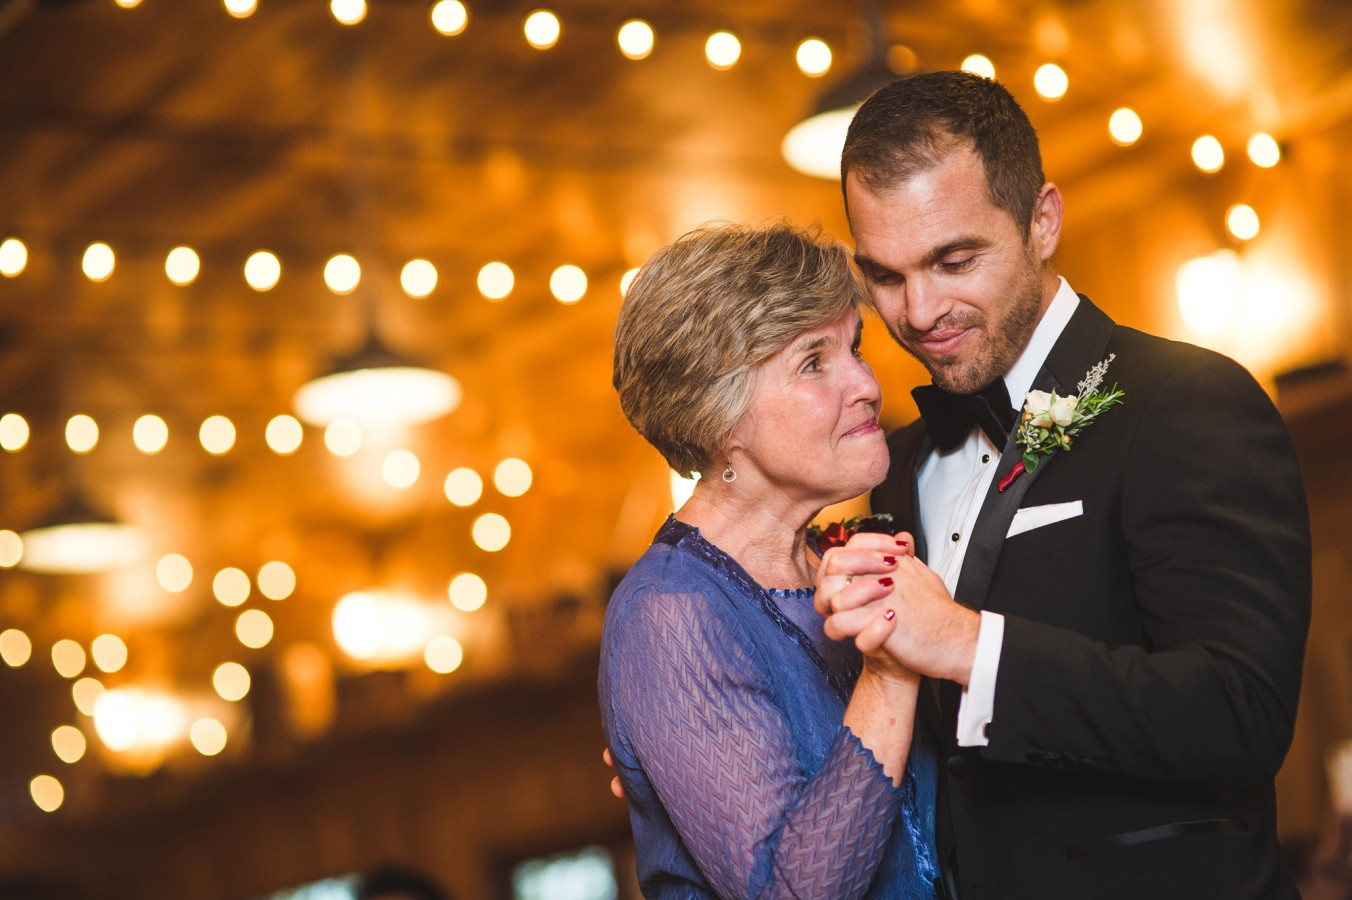 fete-photography-weddings-023